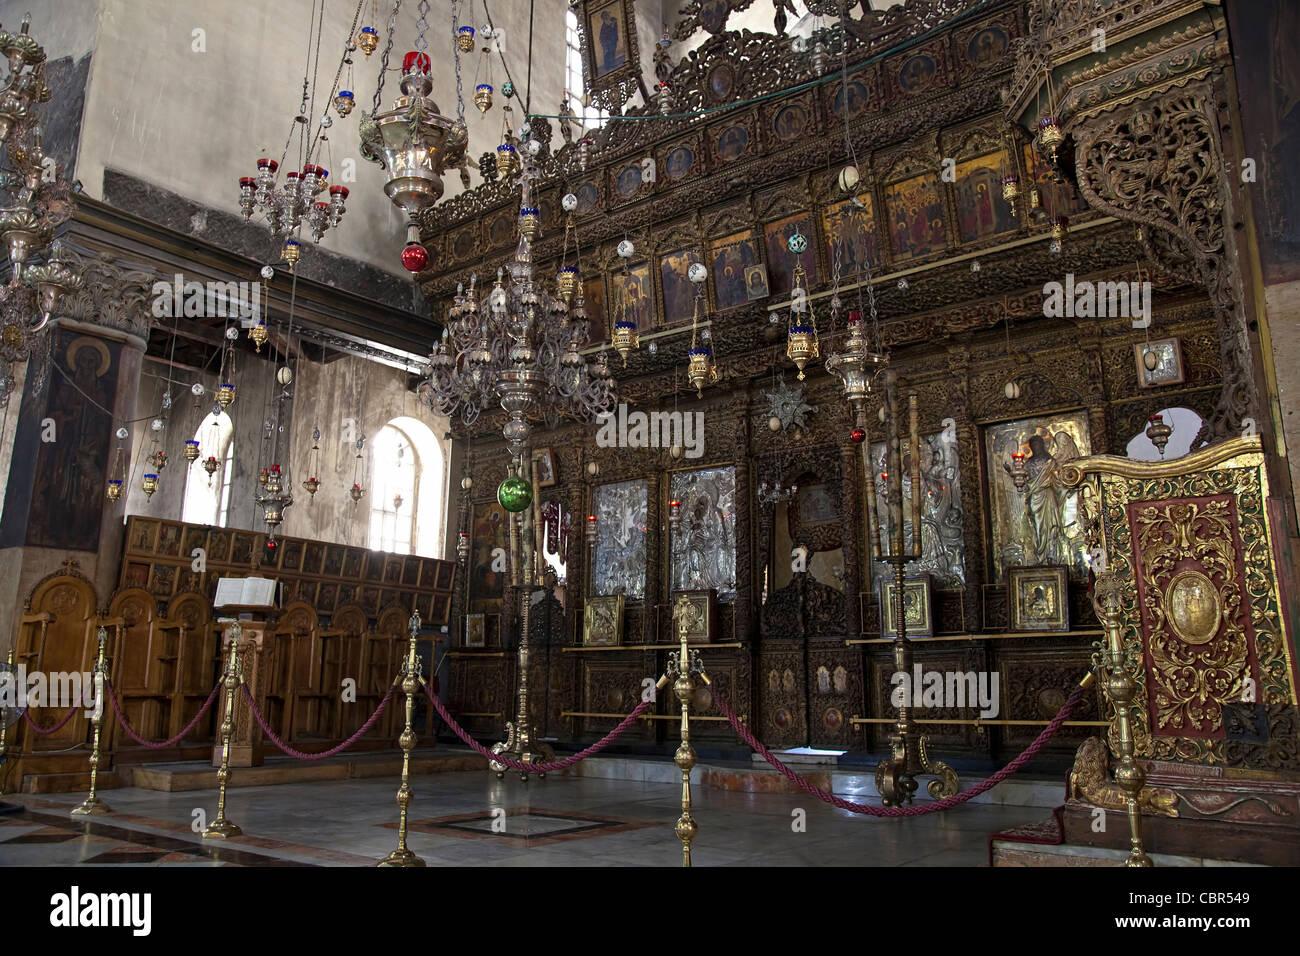 Very rare photos. Interior of church of the Nativity of Jesus Christ. Jesus Christ cradle - Stock Image